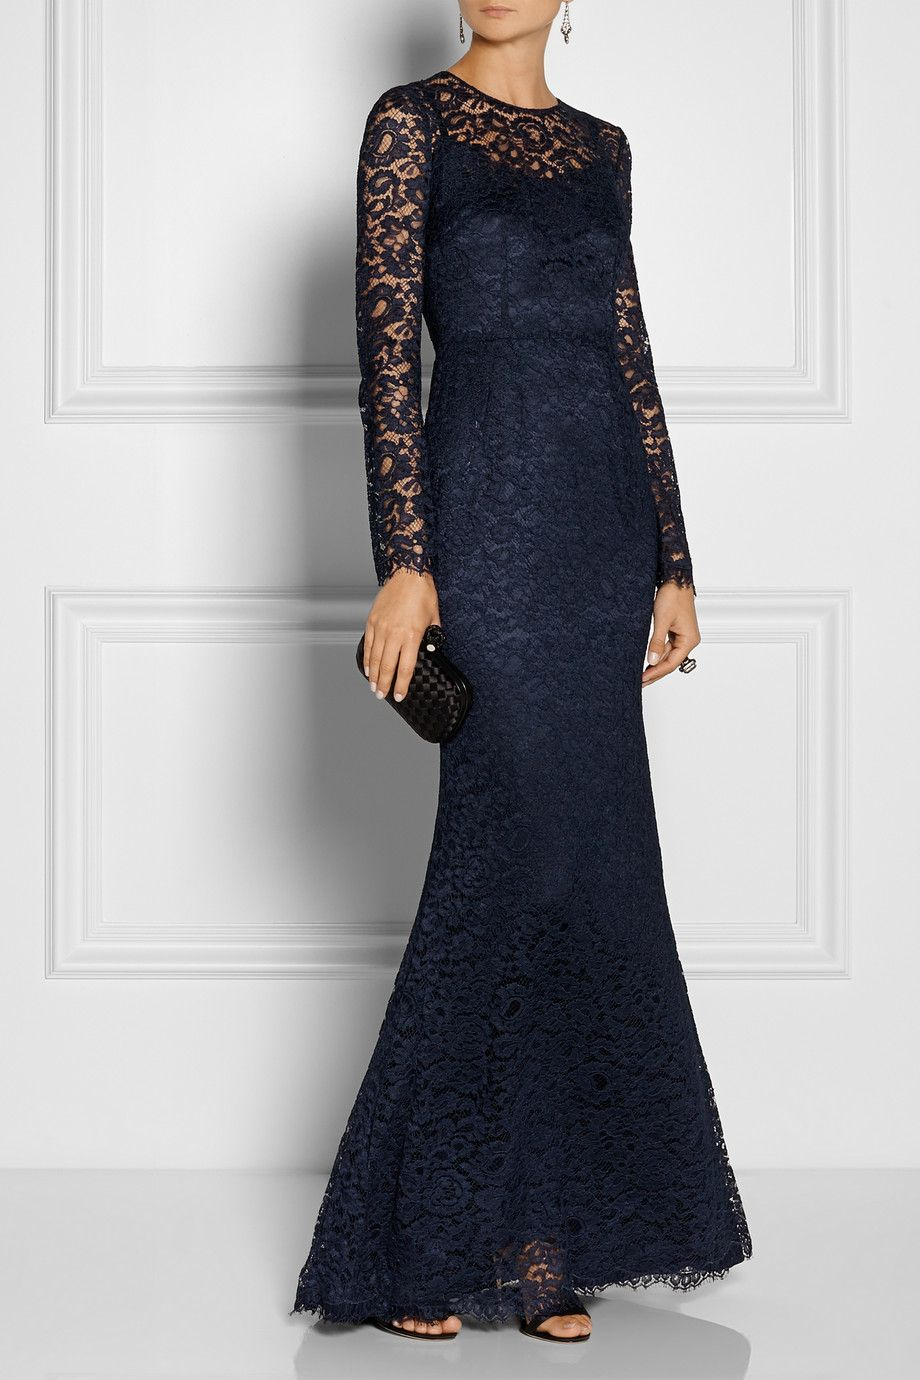 Dolce & Gabbana|Lace gown|NET-A-PORTER.COM